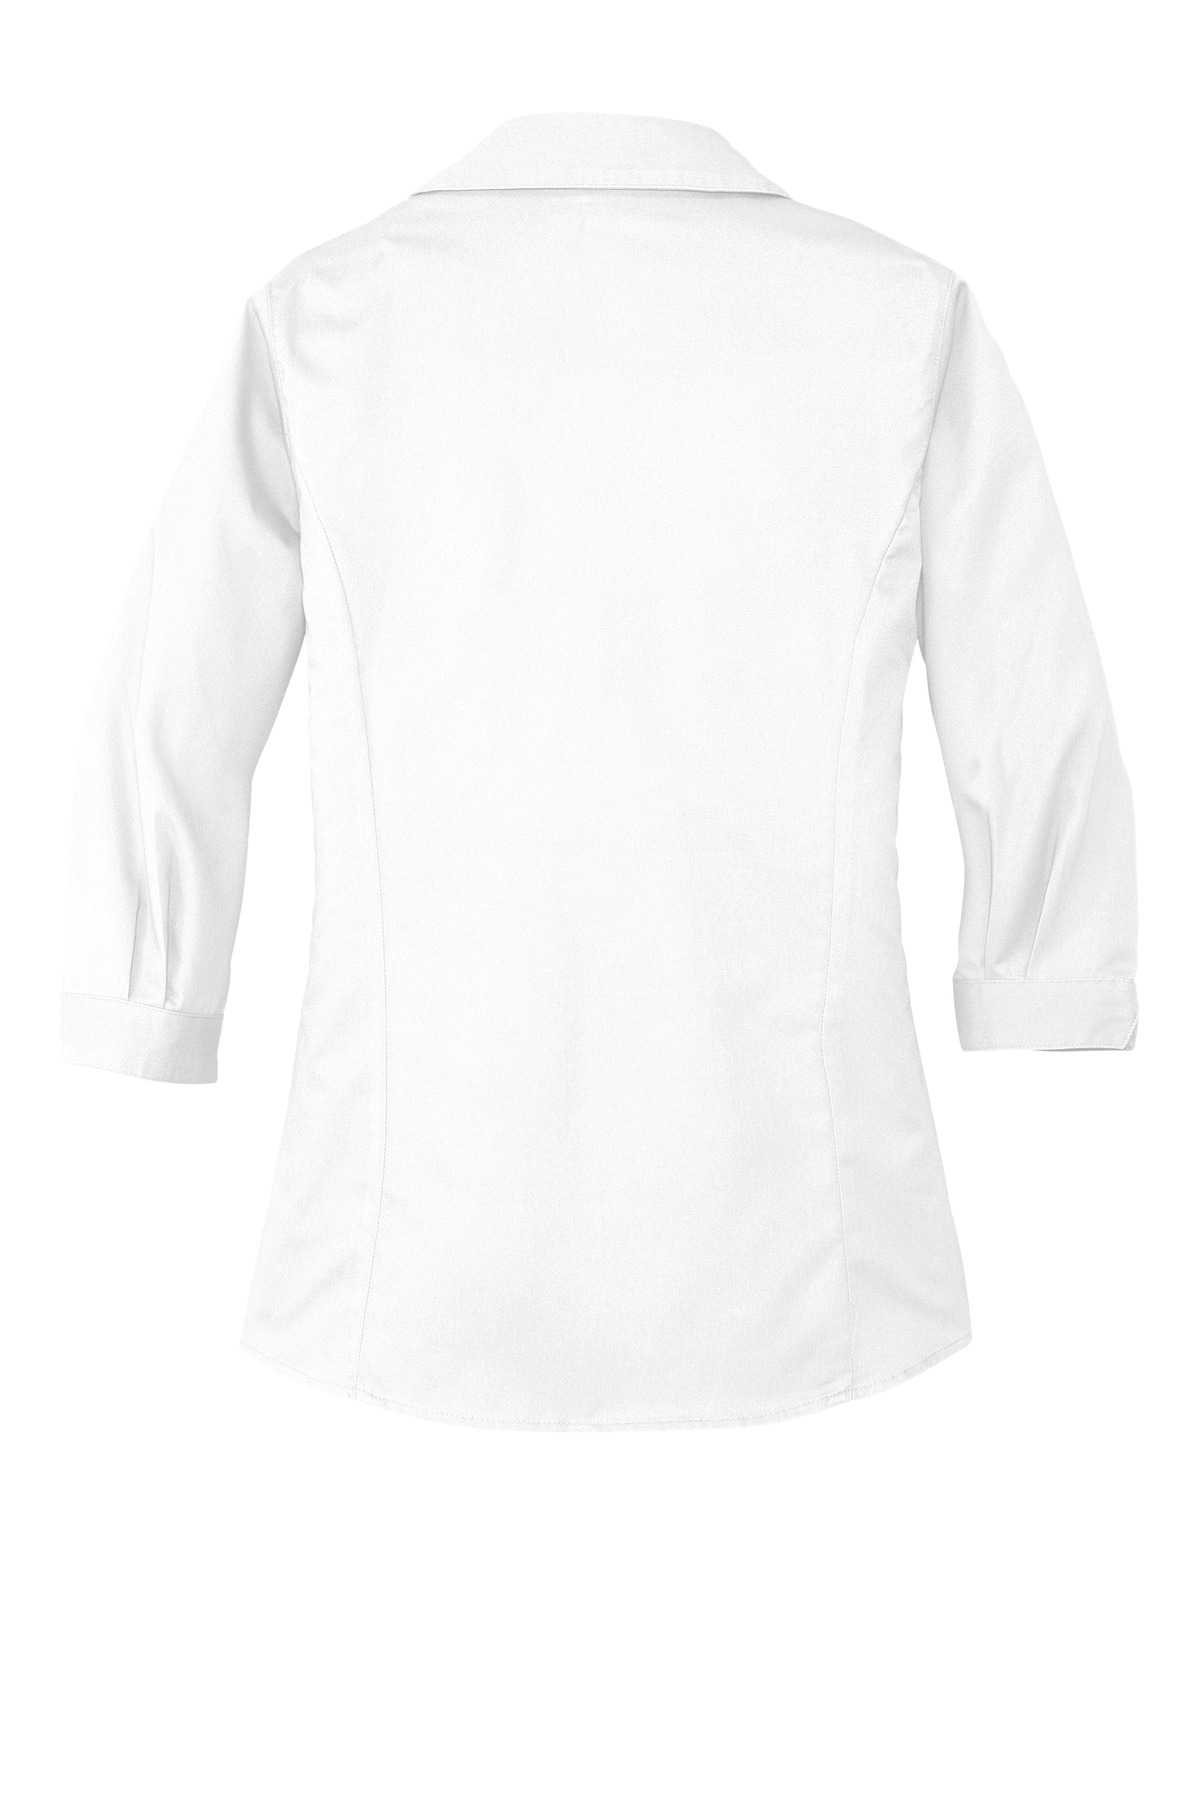 Ladies 3/4-Sleeve Blouse - RCL2200